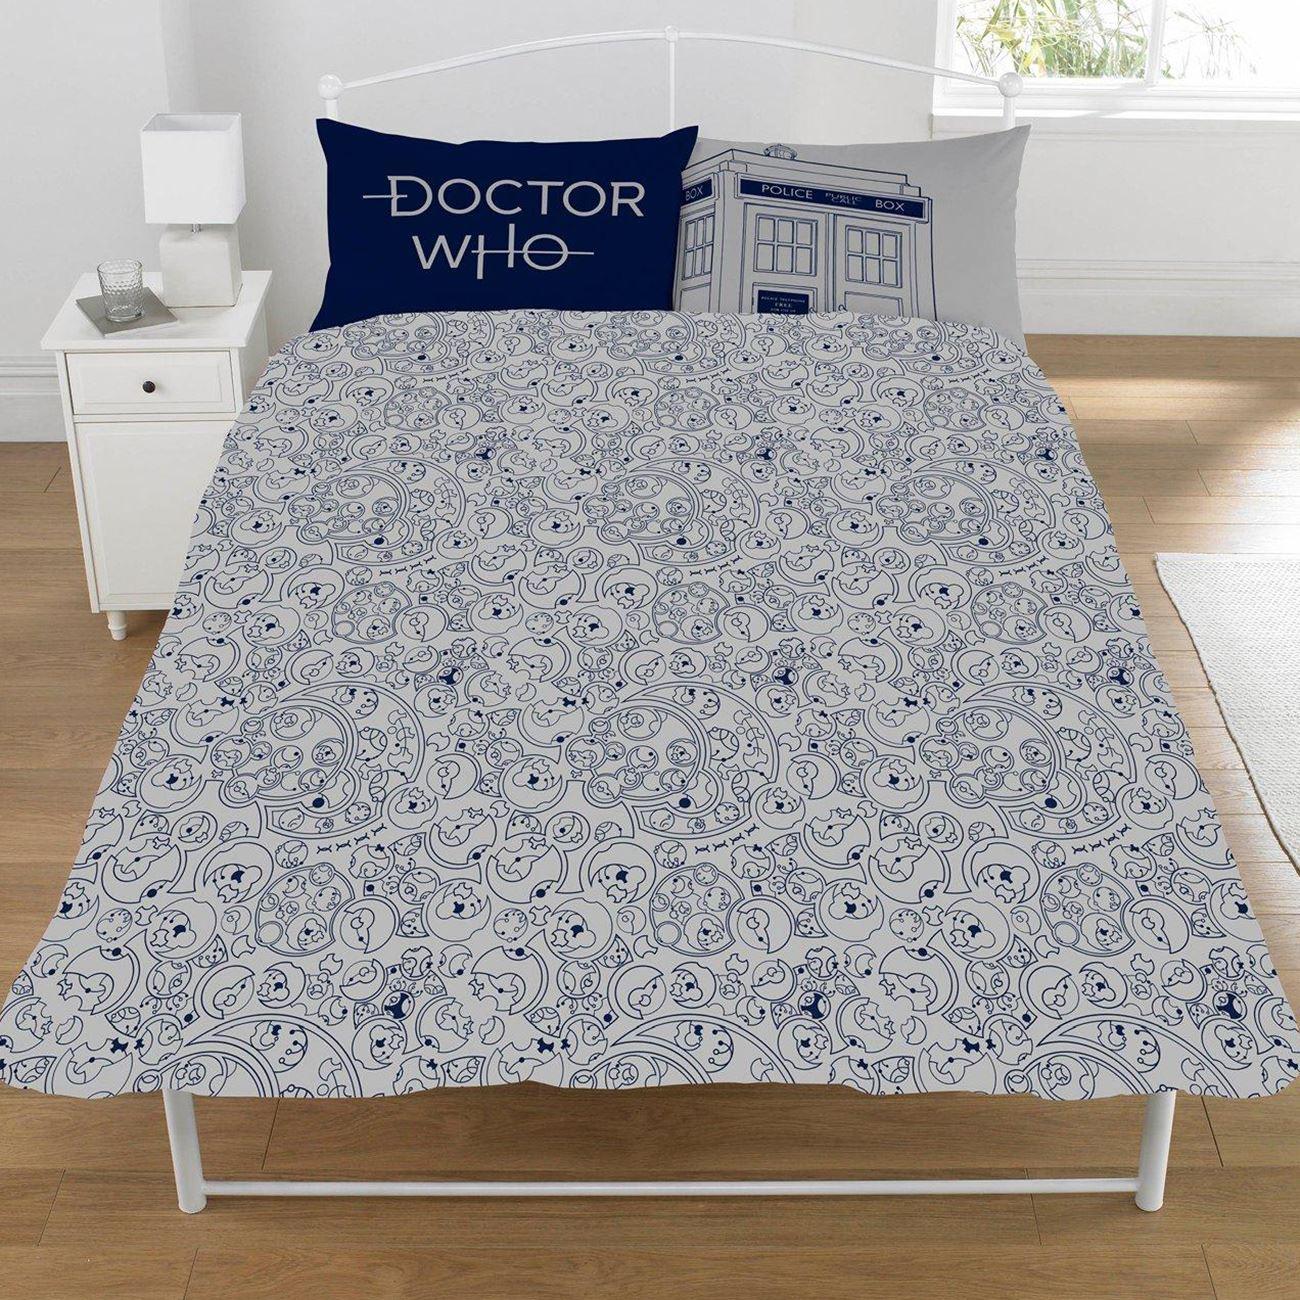 Doctor Who Klassisch Tardis Doppelbett Bezug Set Wendbare Bettwäsche